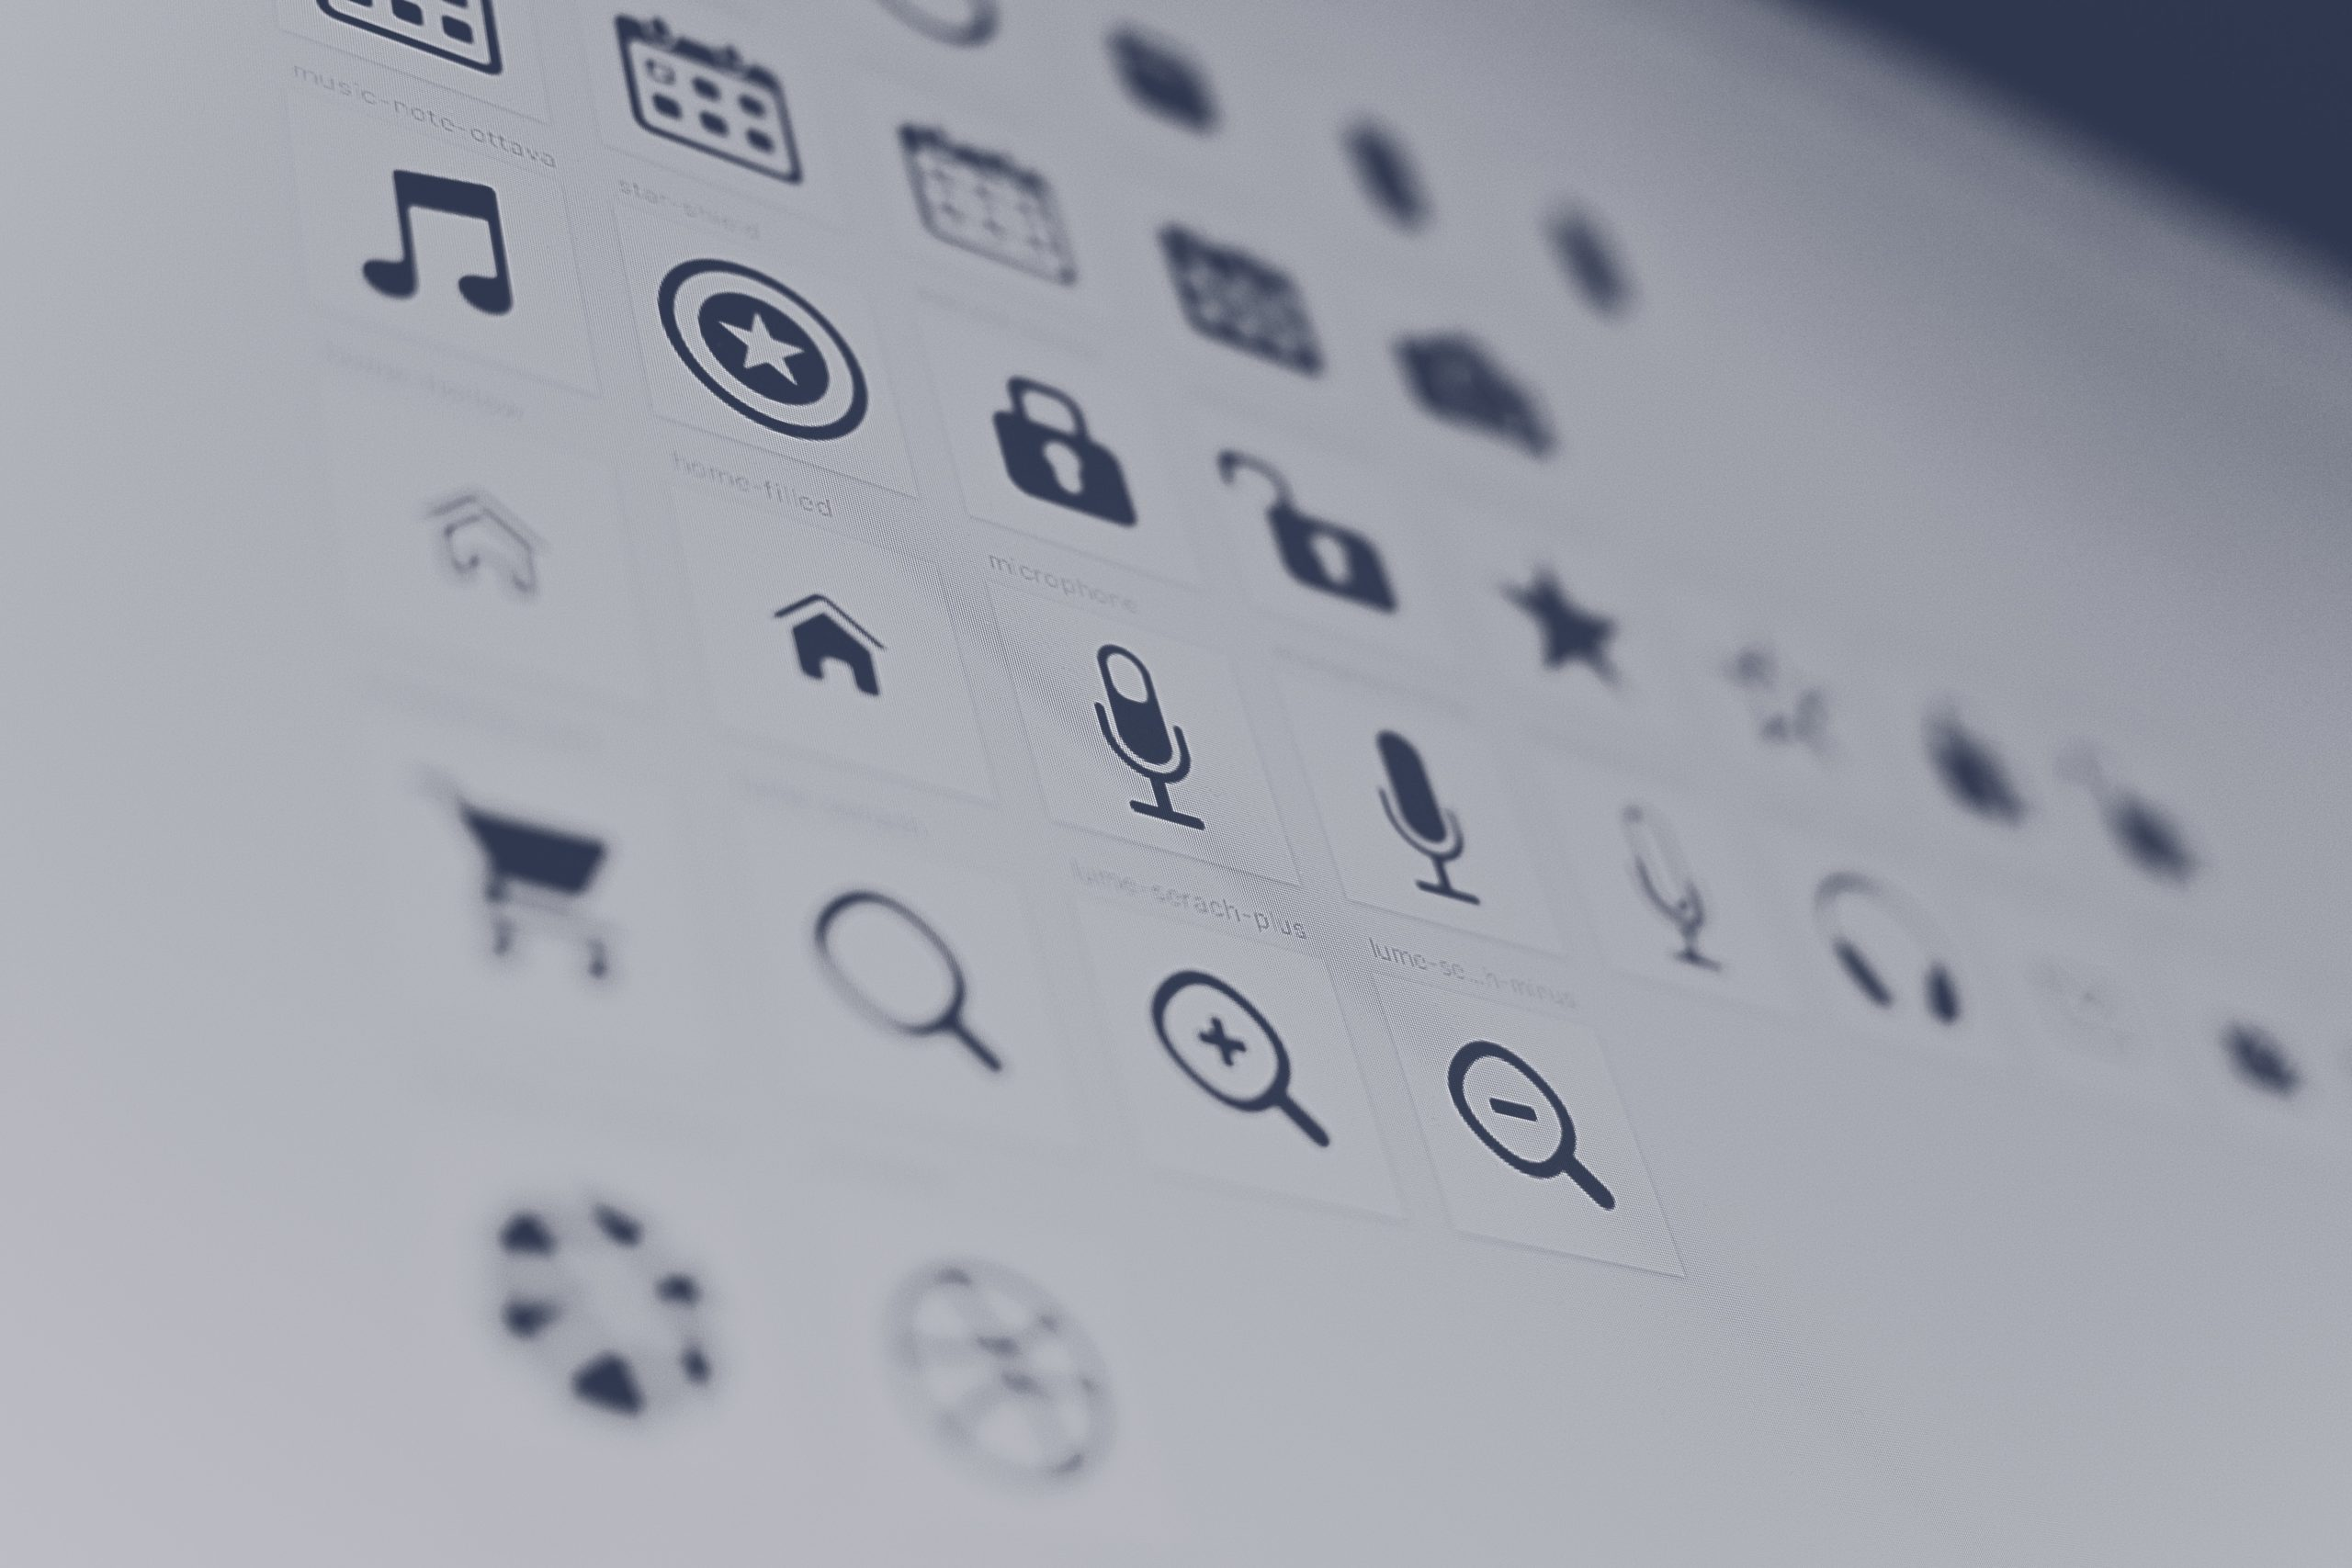 iconのイメージ画像